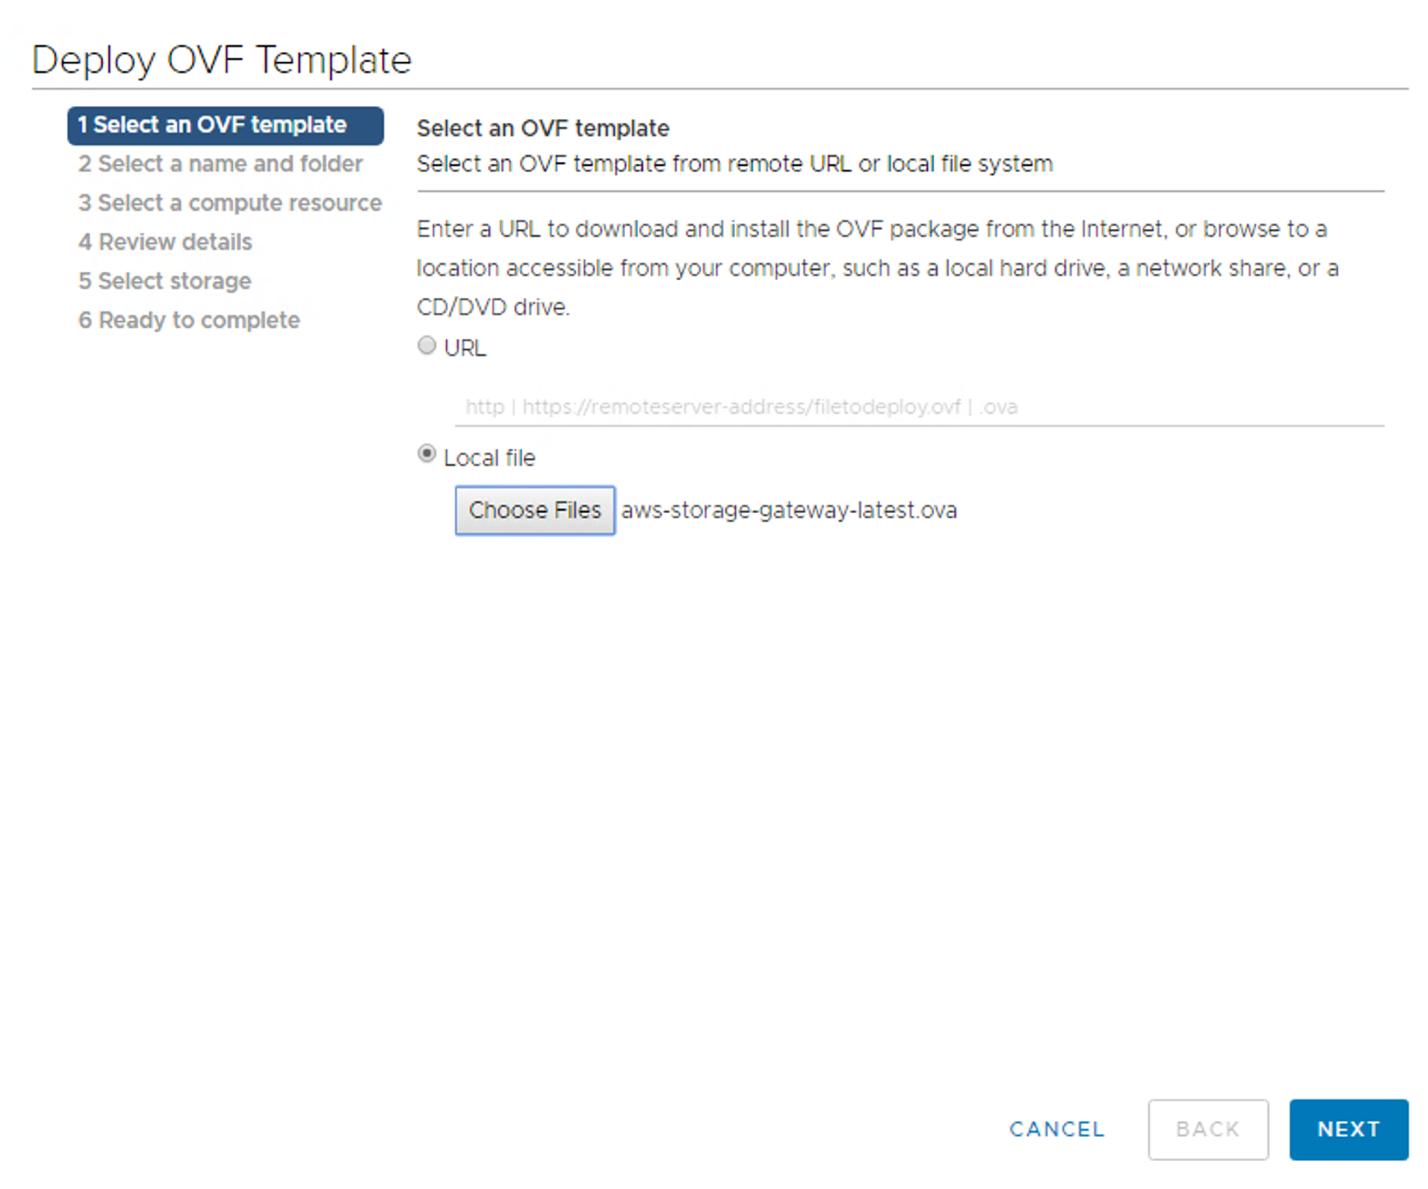 Figure 5. Deploy OVF Template